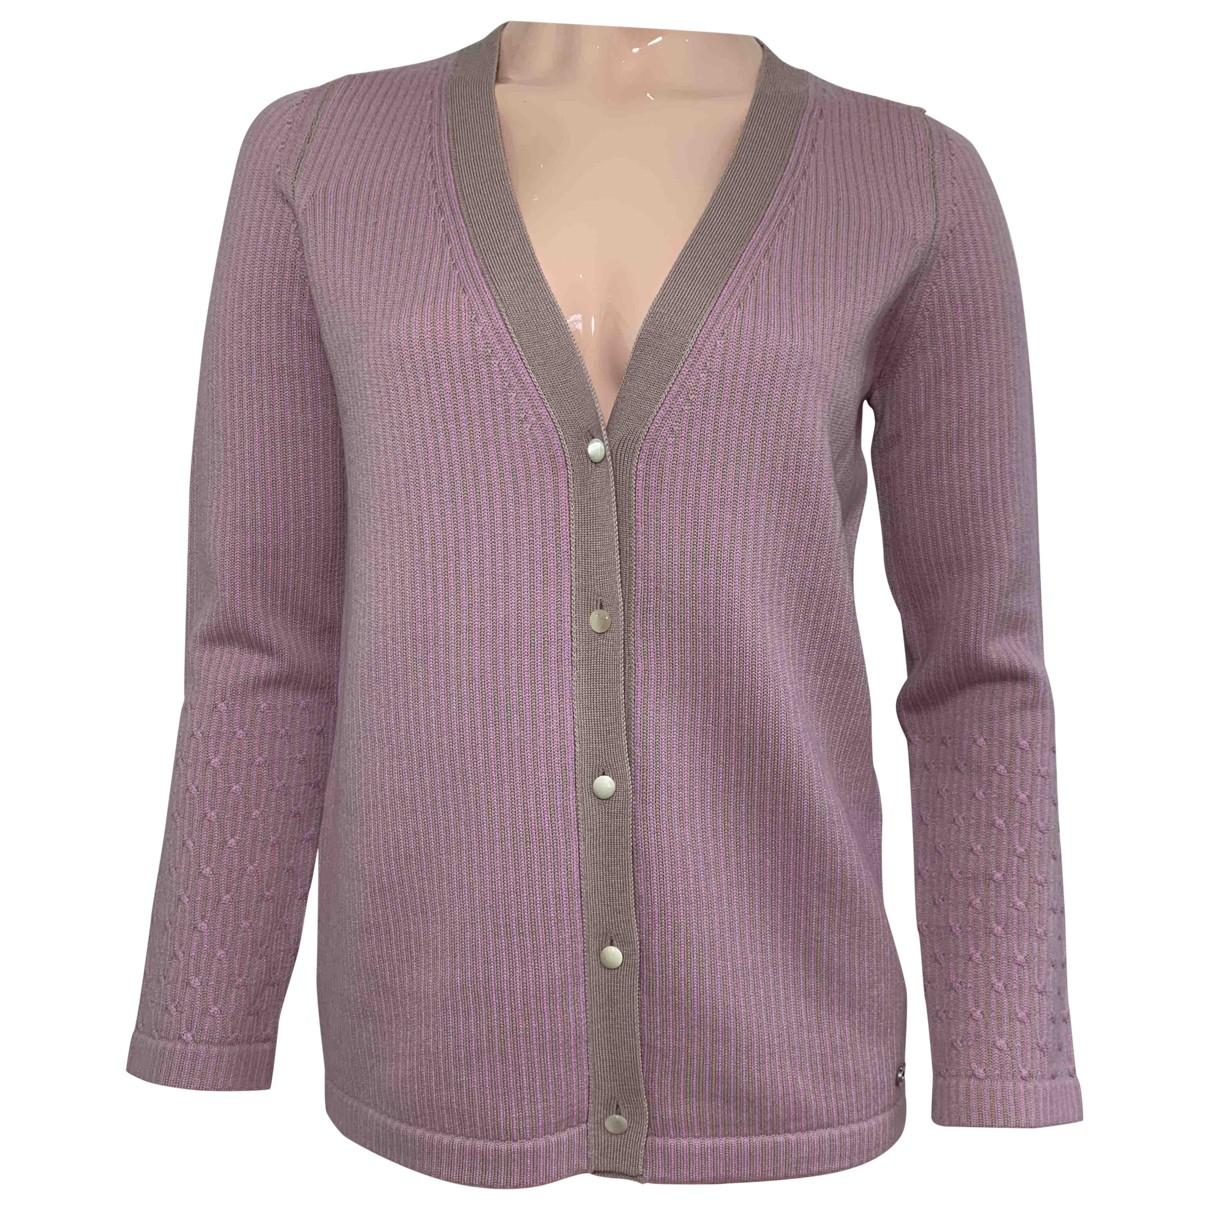 Salvatore Ferragamo - Pull   pour femme en laine - rose